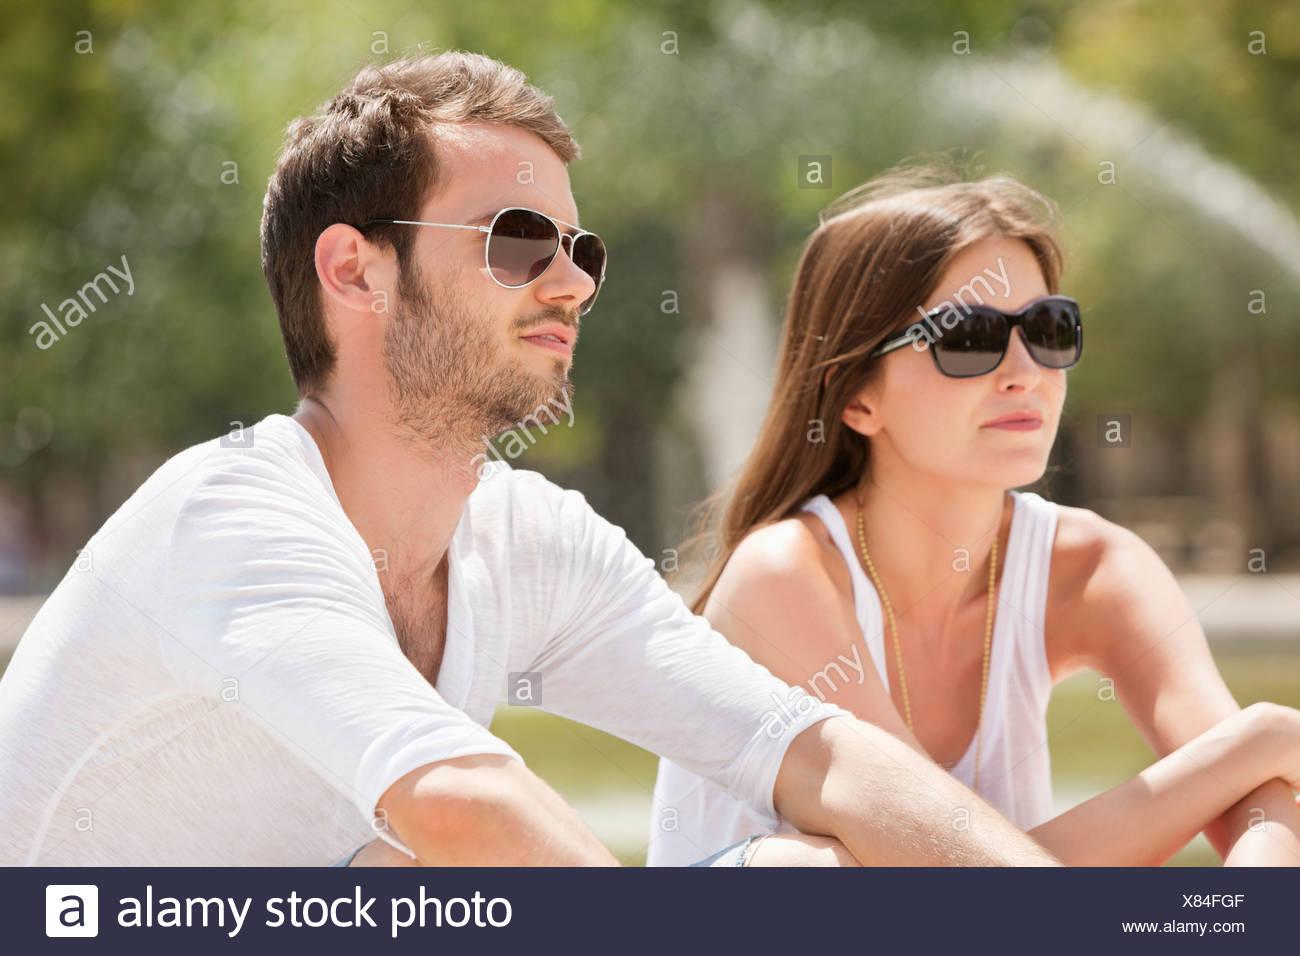 Couple sitting in a garden, Bassin octogonal, Jardin des Tuileries, Paris, Ile-de-France, France - Stock Image